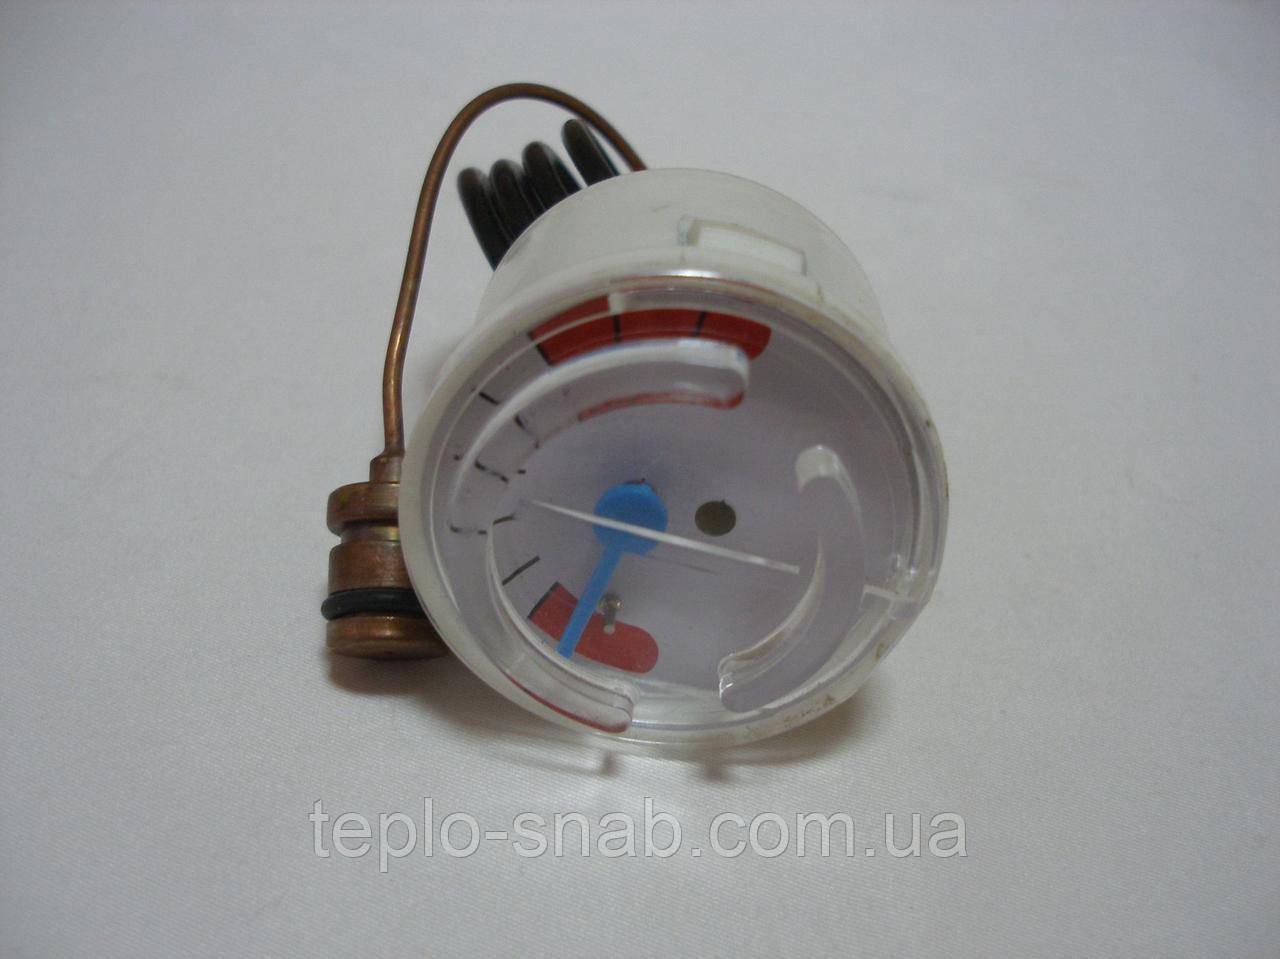 Манометр для газового навесного котла Beretta Ciao, Ciao N, Ciao J. R10024019